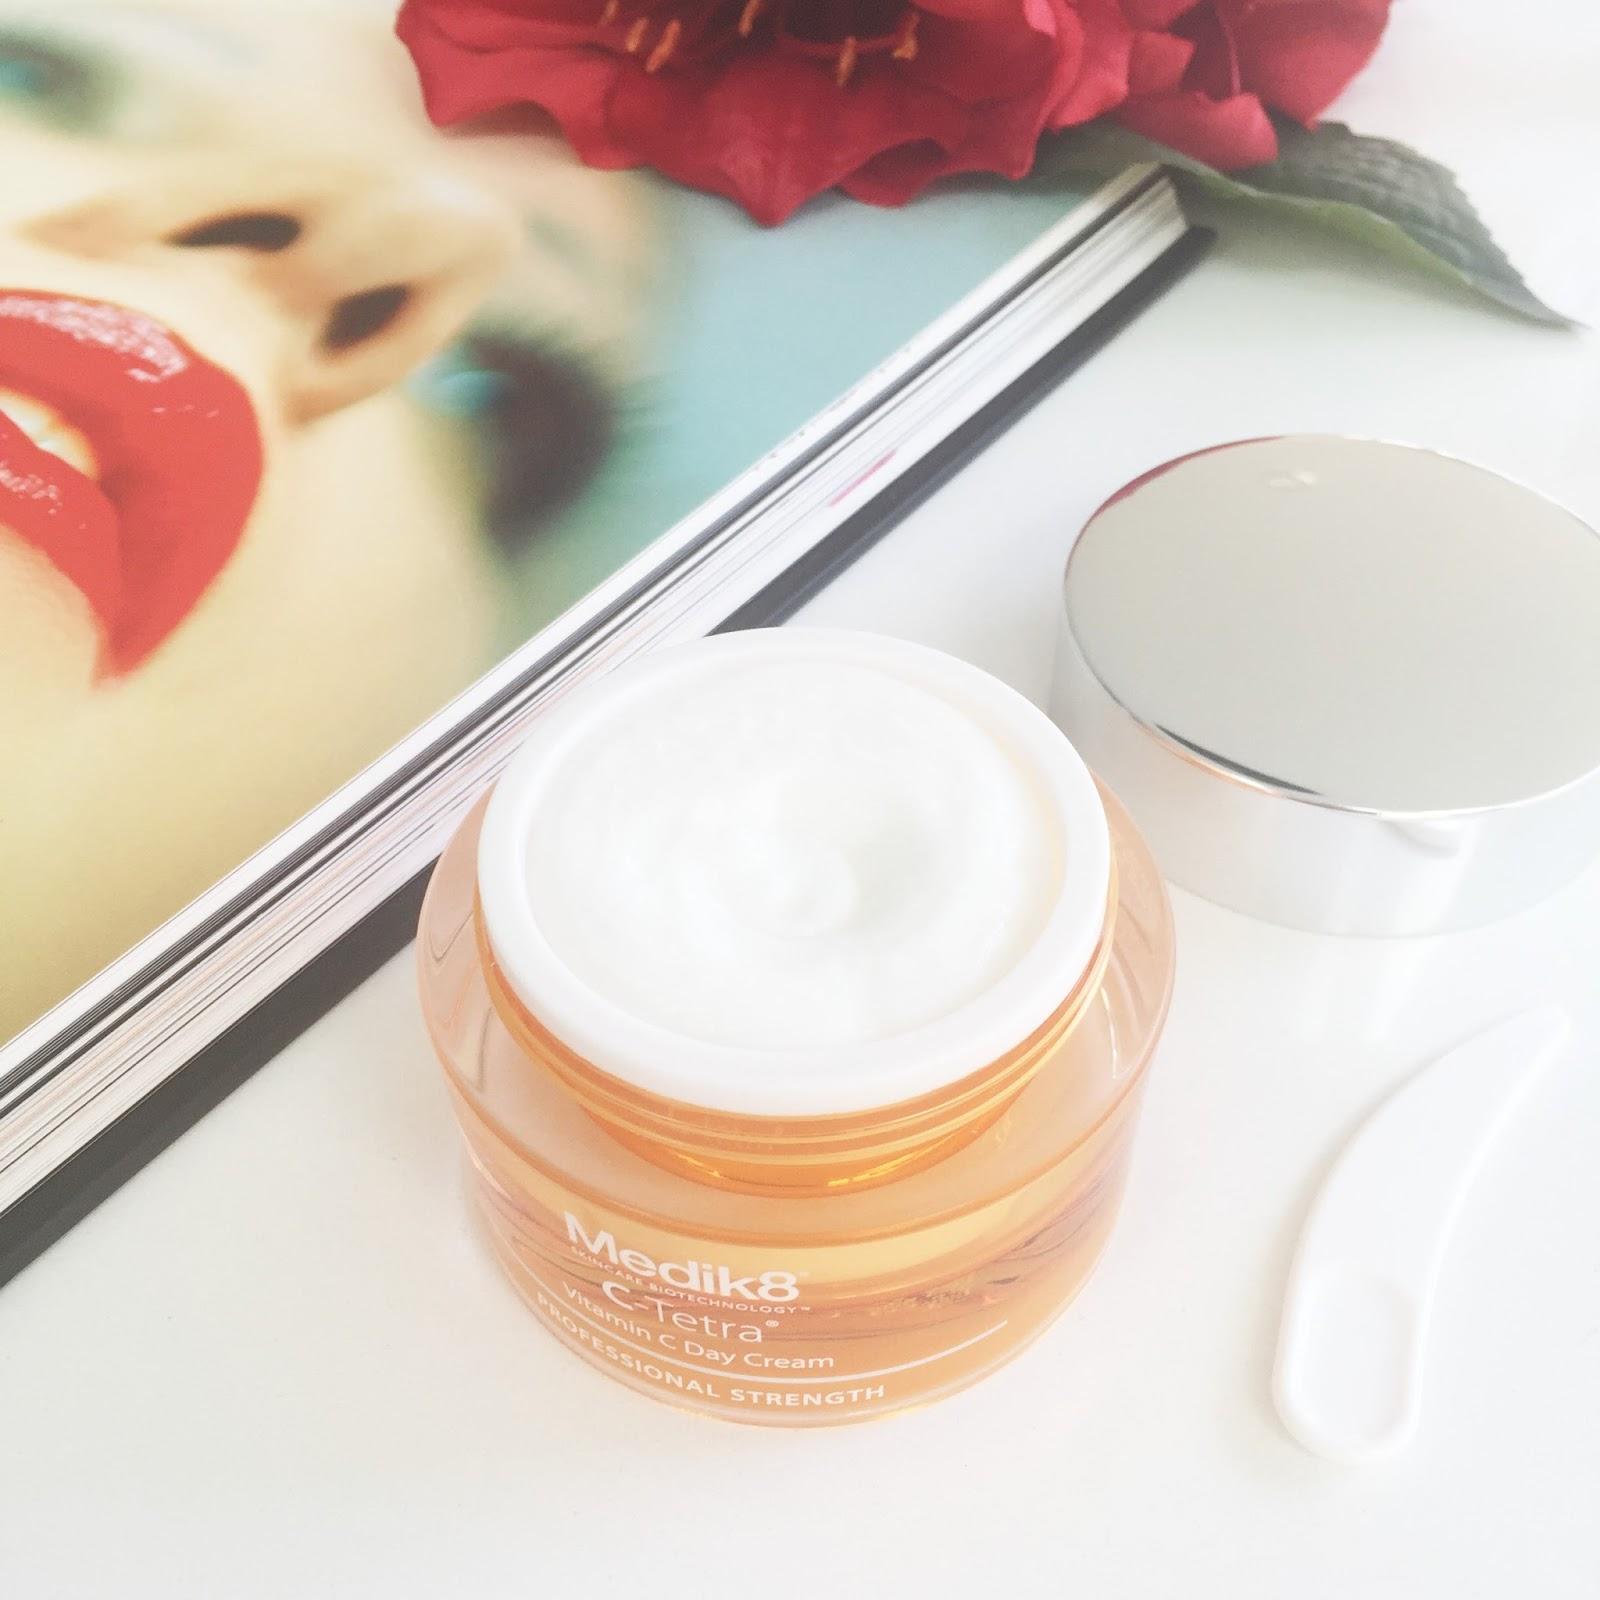 Medik8 C-Tetra Vitamin C Day Cream via Beauty and Lifestyle Hunter